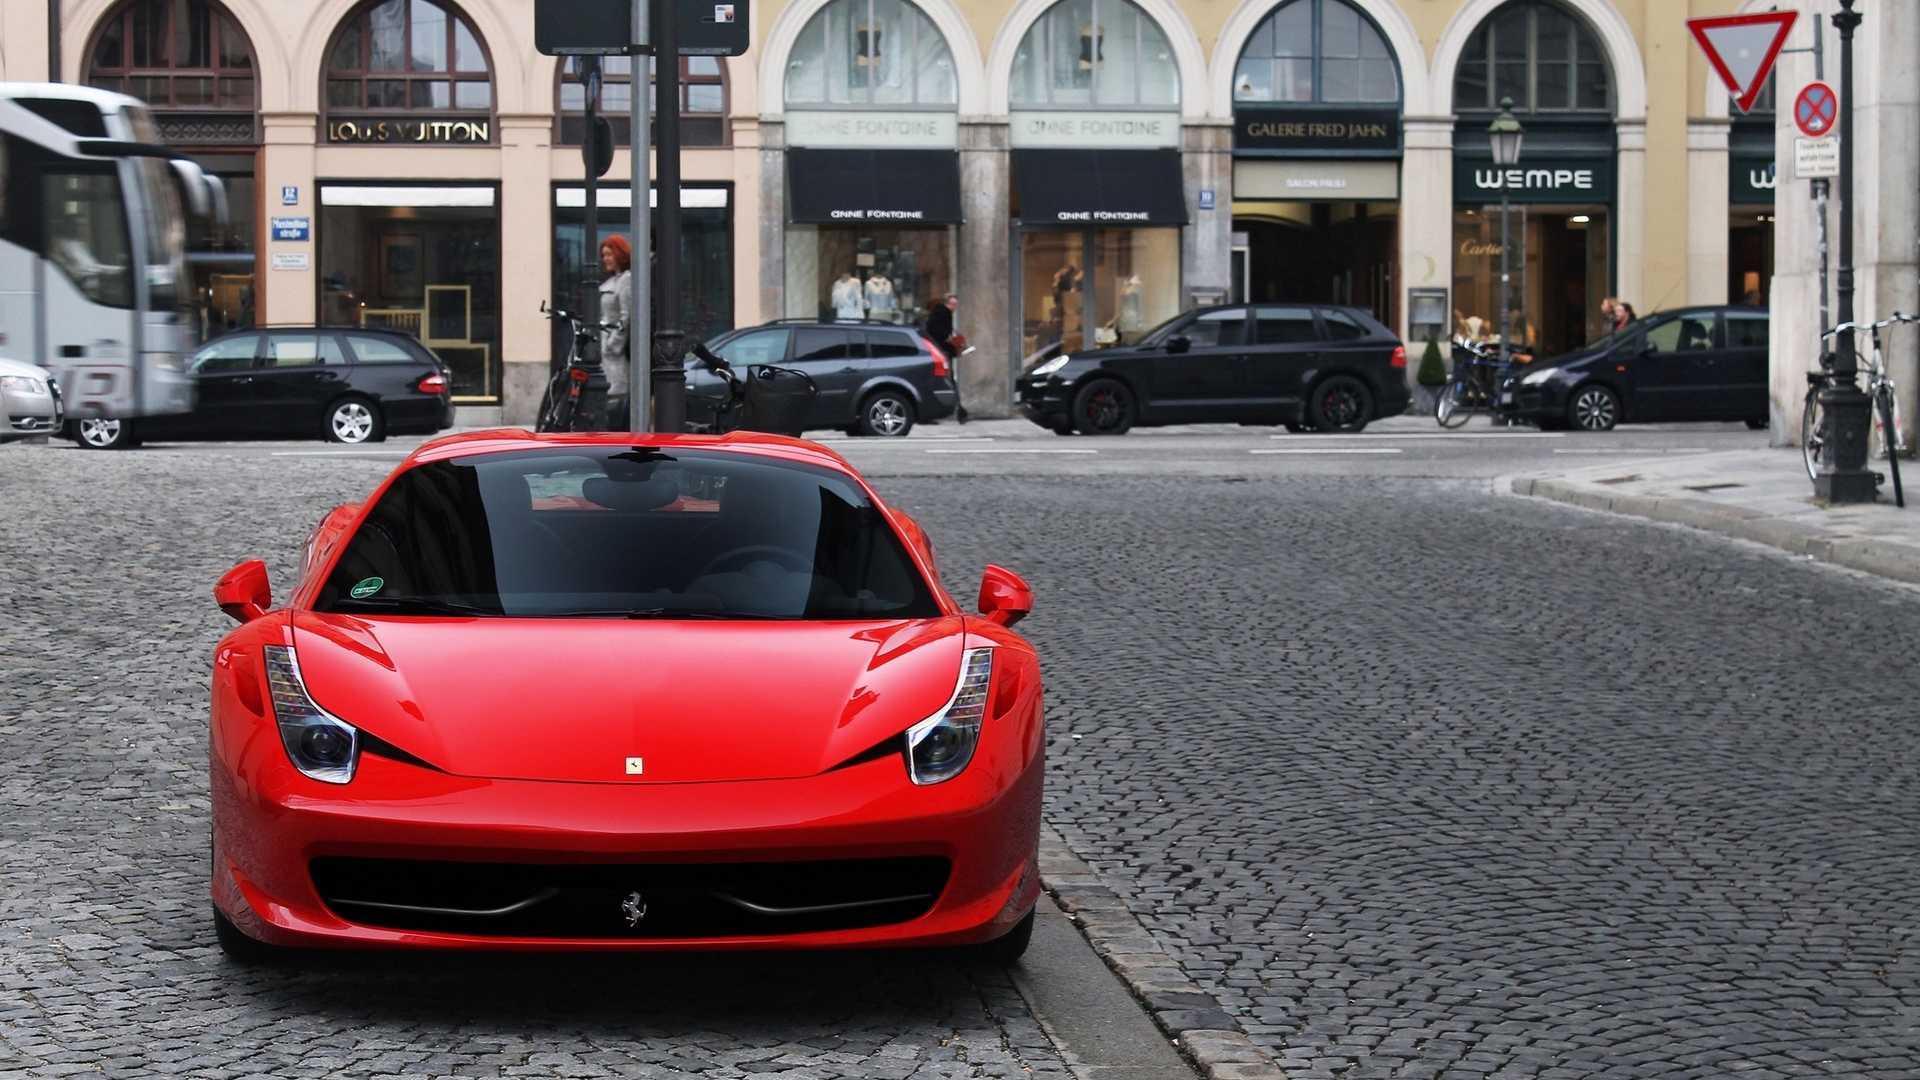 Ferrari 458 speciale - обзор, цены, видео, технические характеристики феррари 458 специале